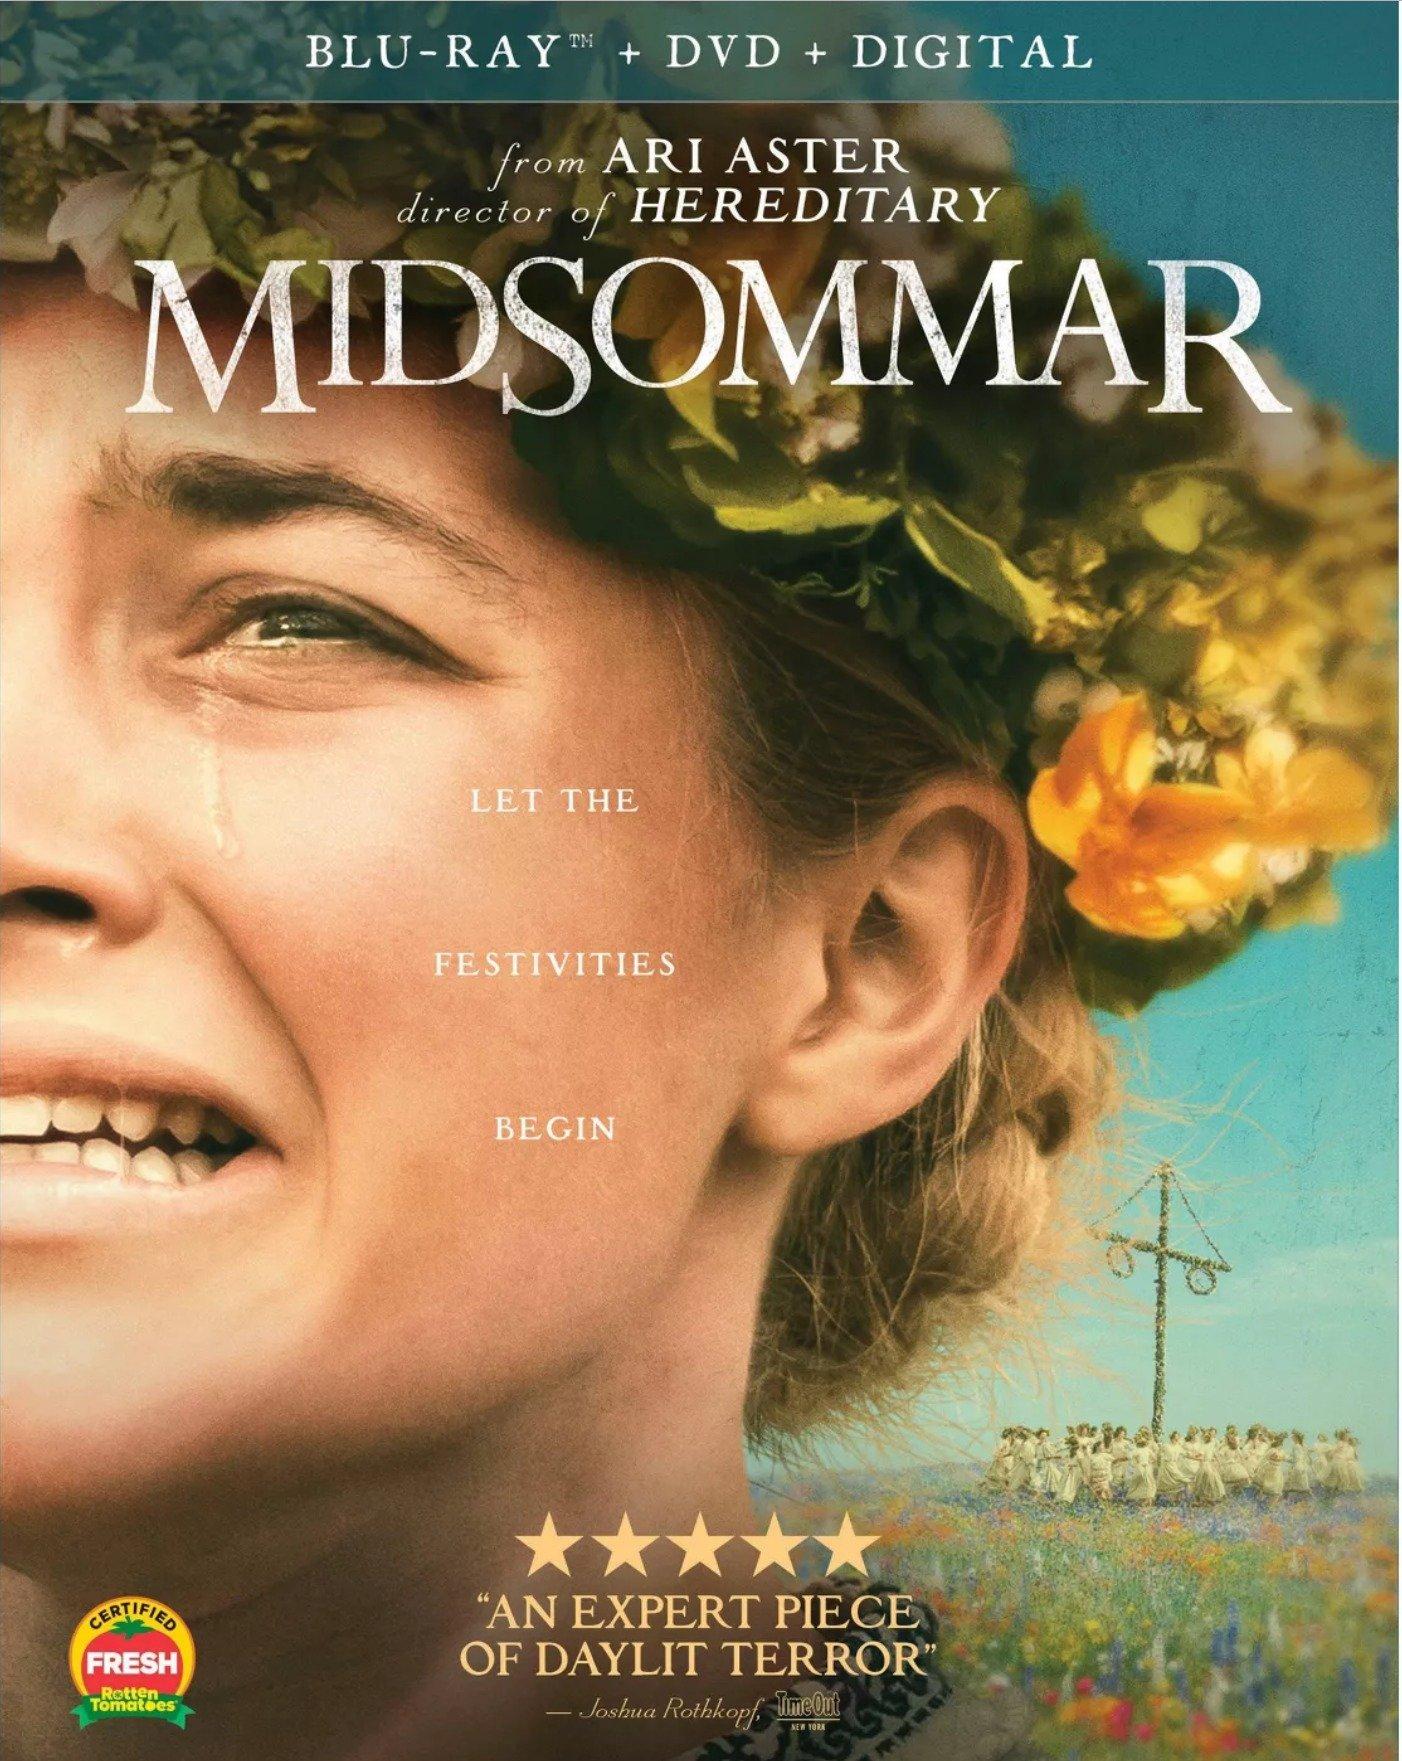 Midsommar (2019) poster image